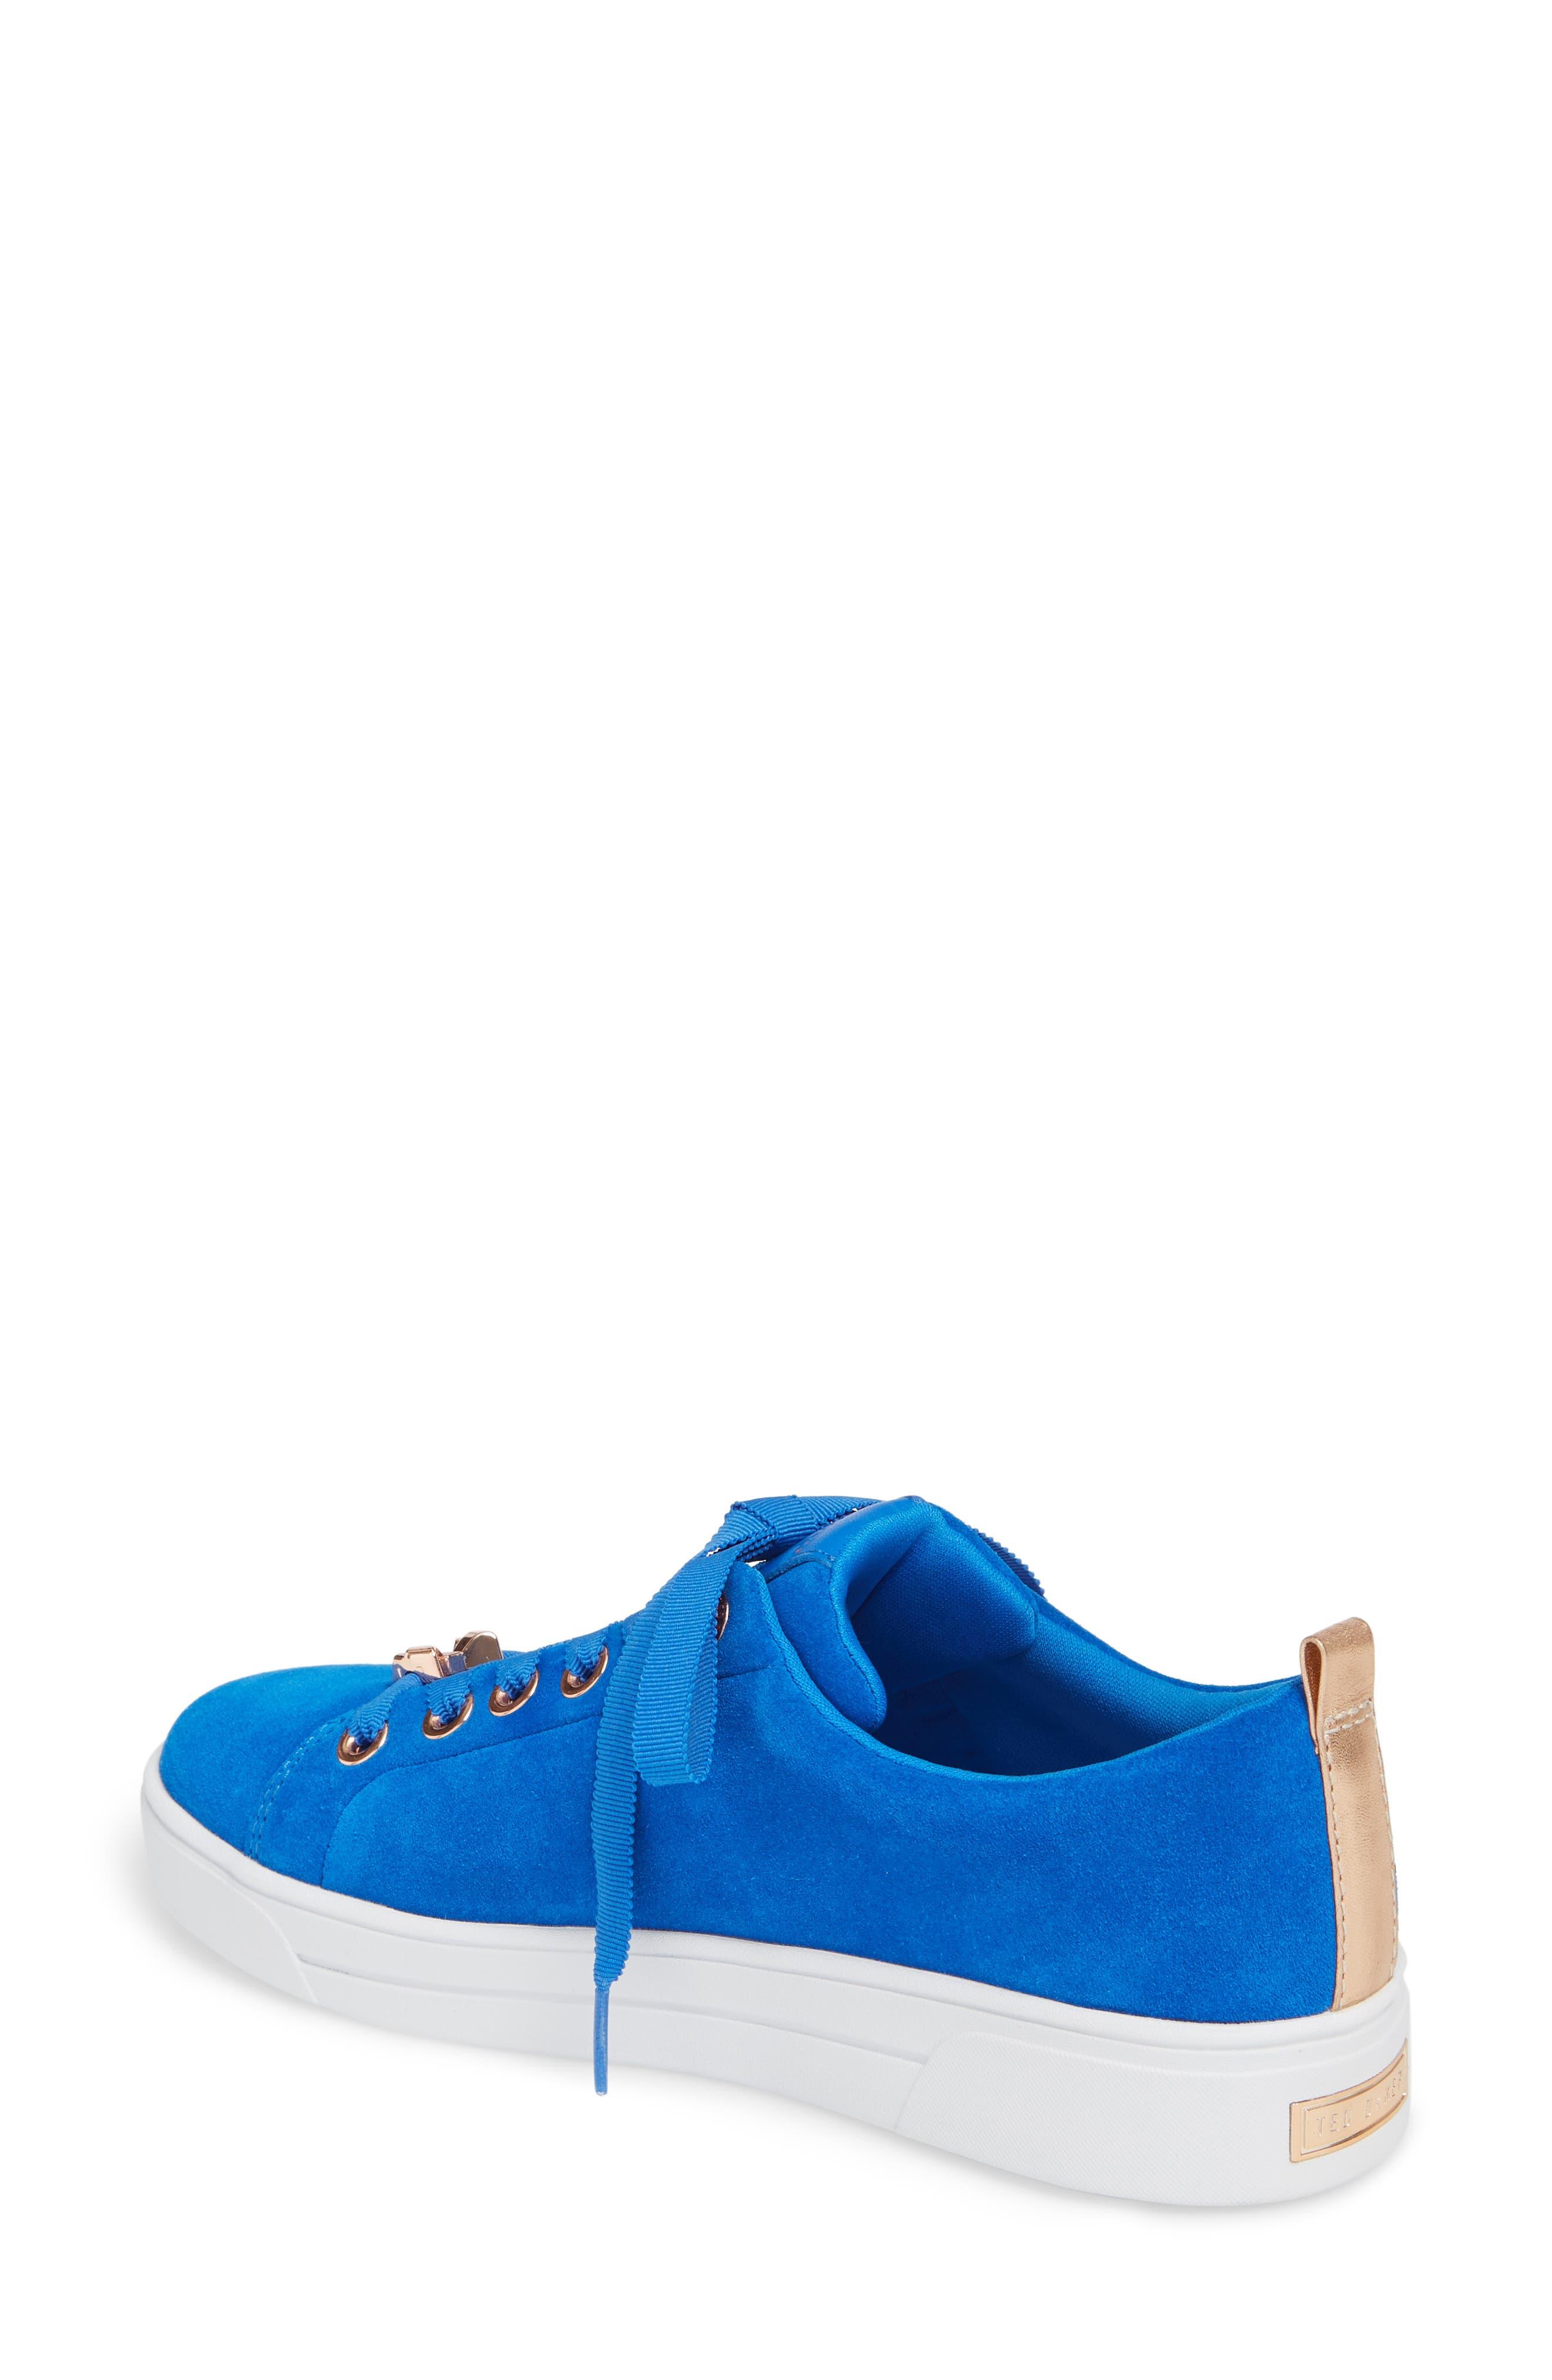 Eryin Sneaker,                             Alternate thumbnail 2, color,                             BLUE HARMONY PRINT SUEDE